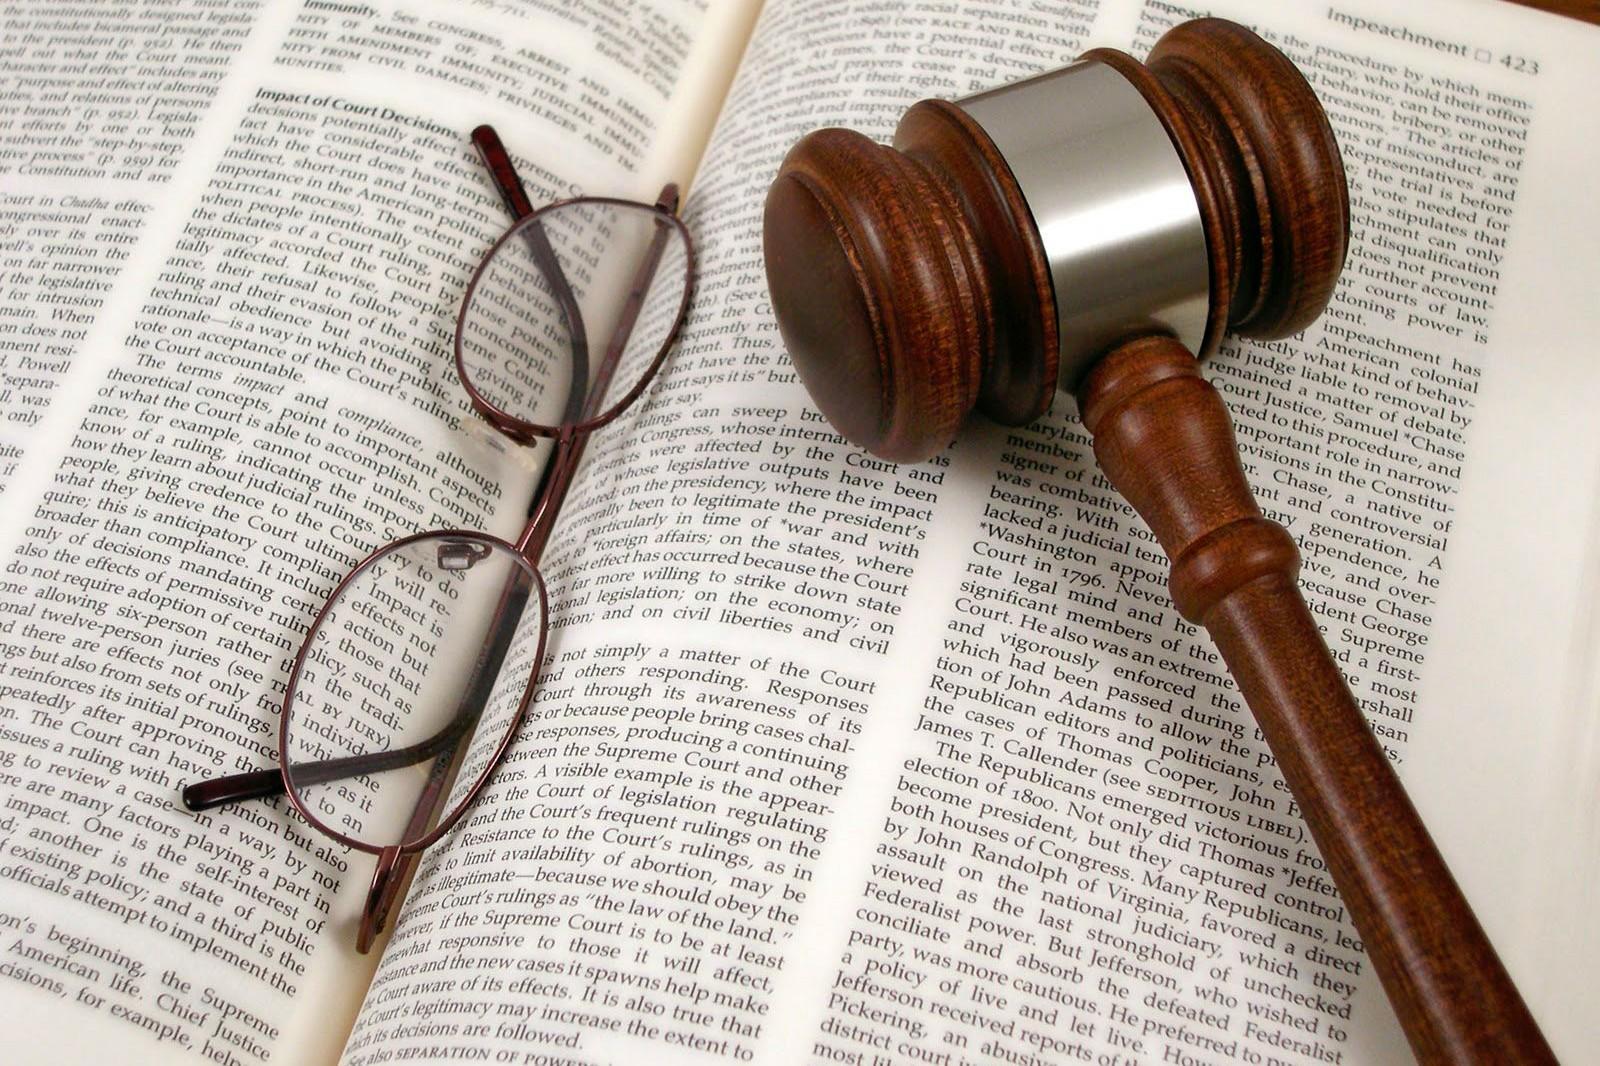 Promissory estoppel e buona fede nel sistema americano: la sentenza Hoffman v Red Owl Stores Inc.